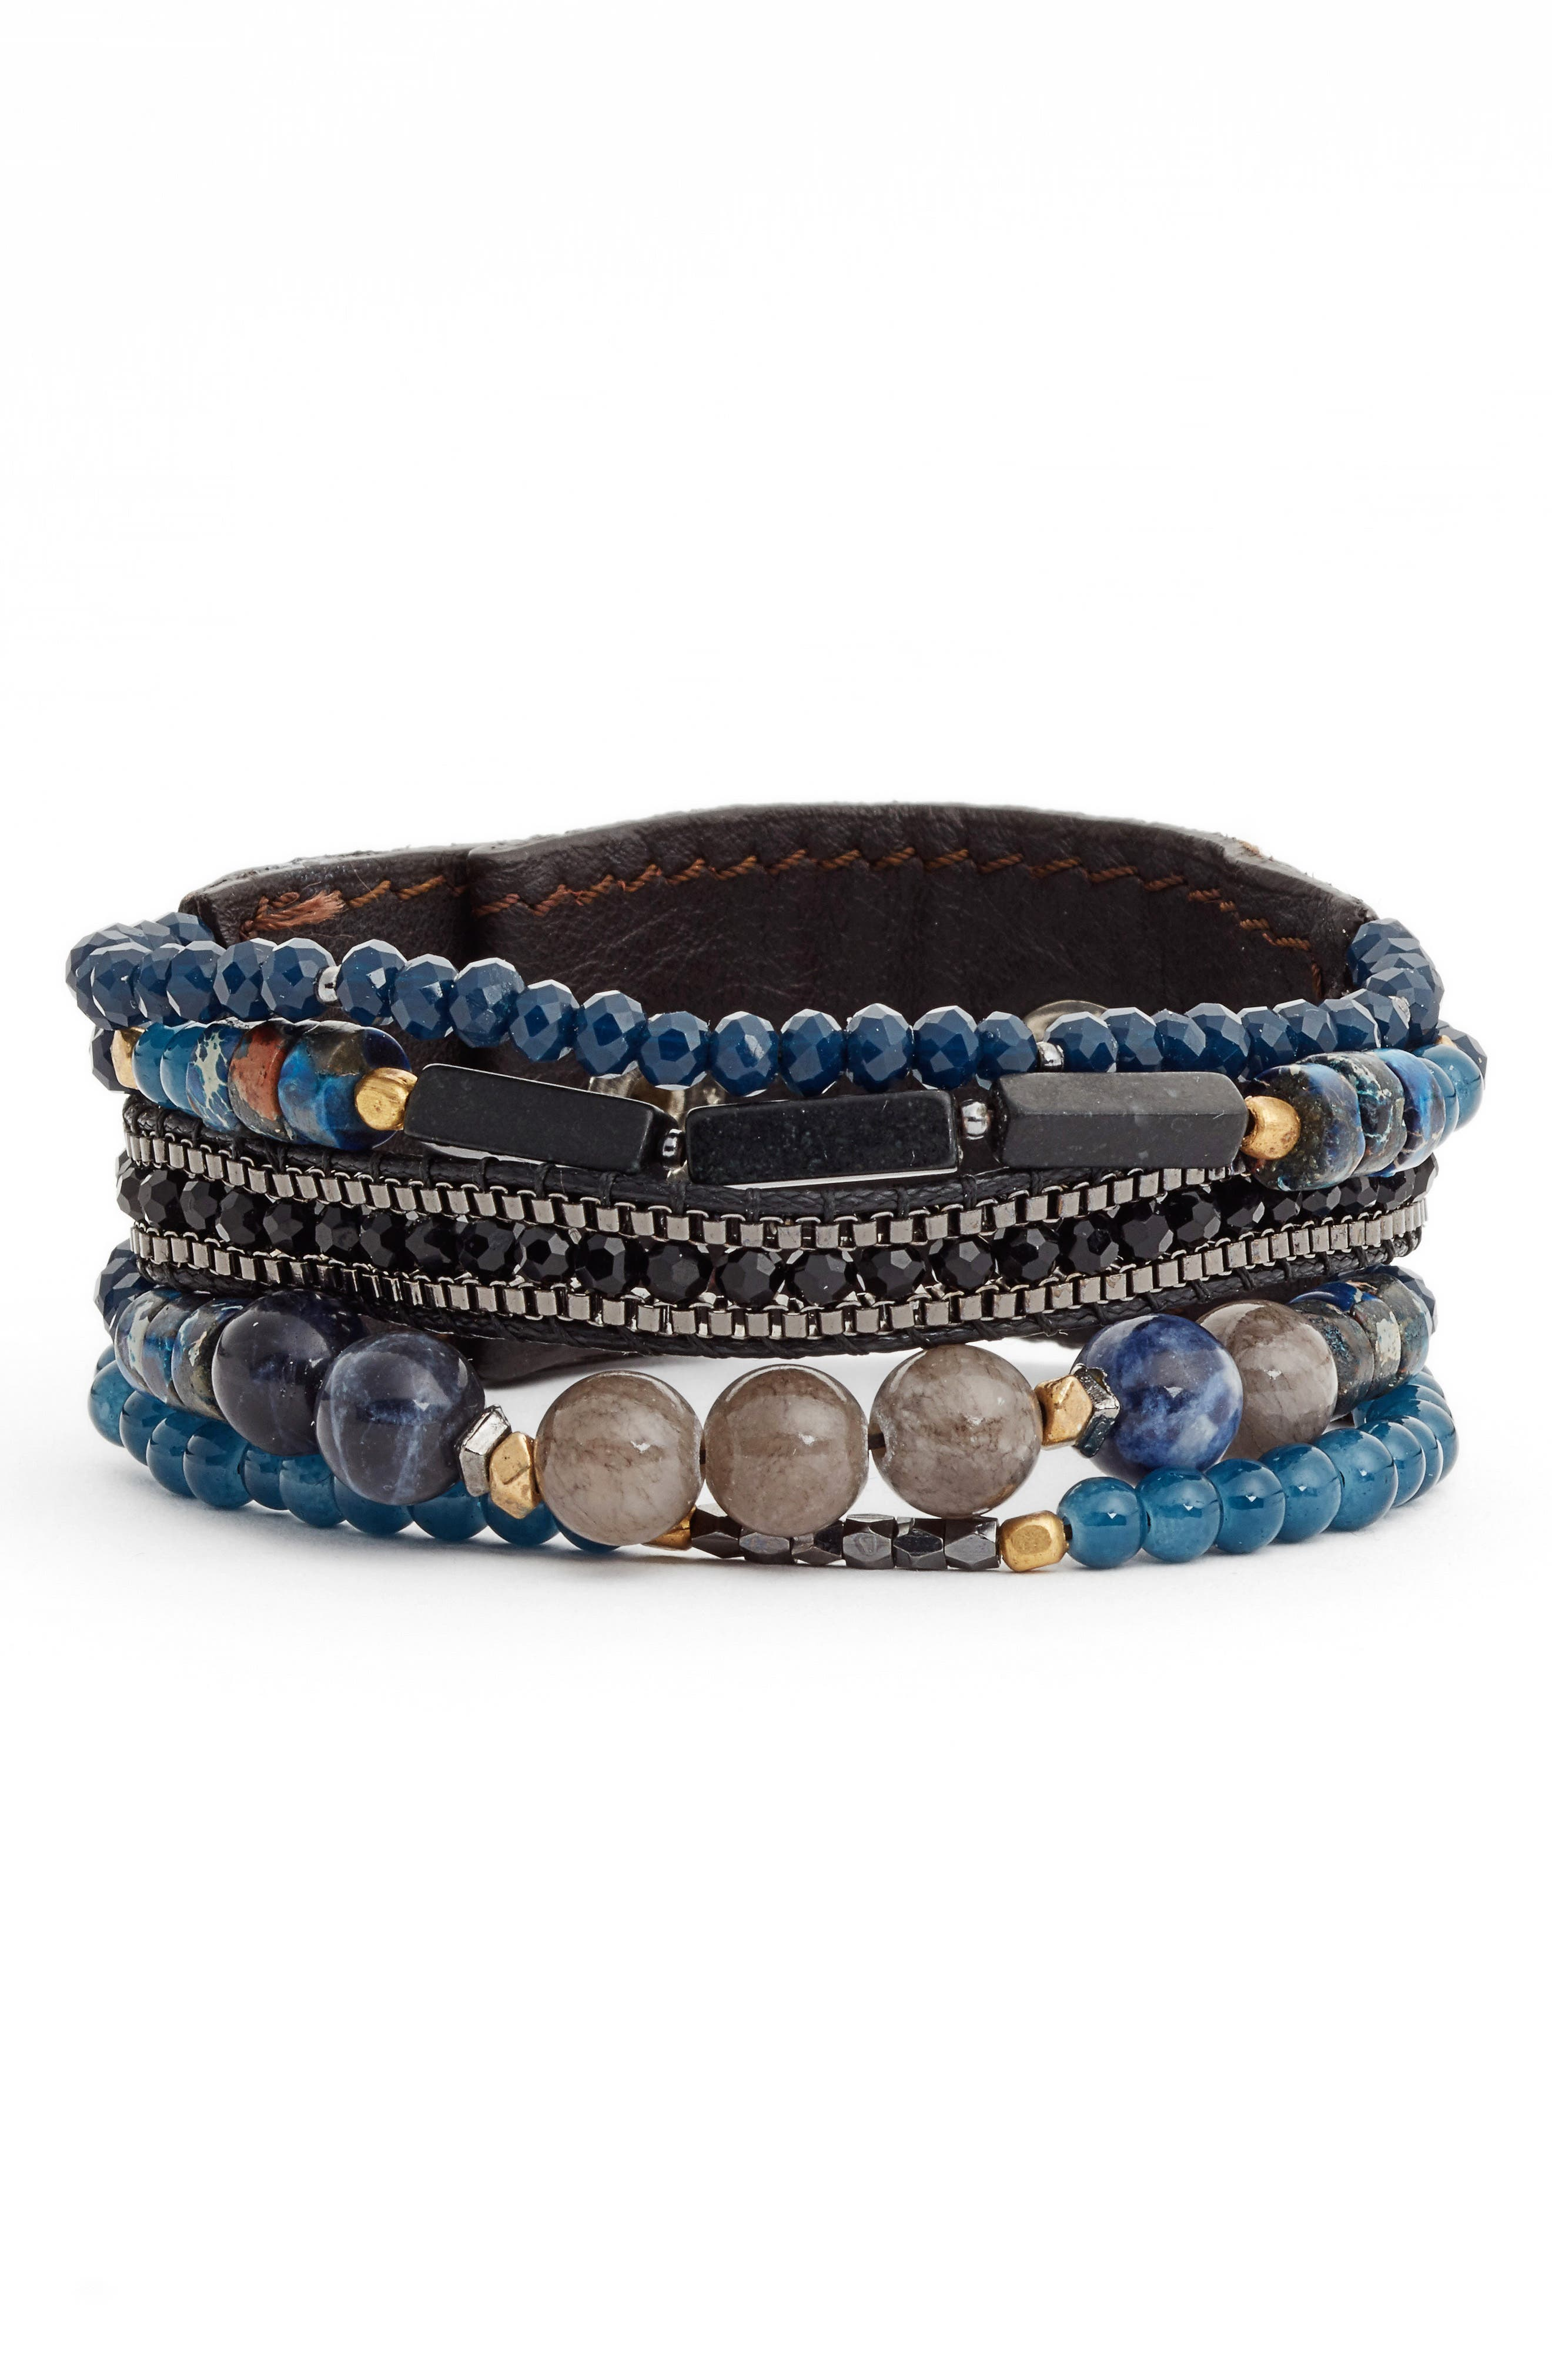 Alternate Image 1 Selected - Nakamol Design Leather, Agate & Lapis Bracelet